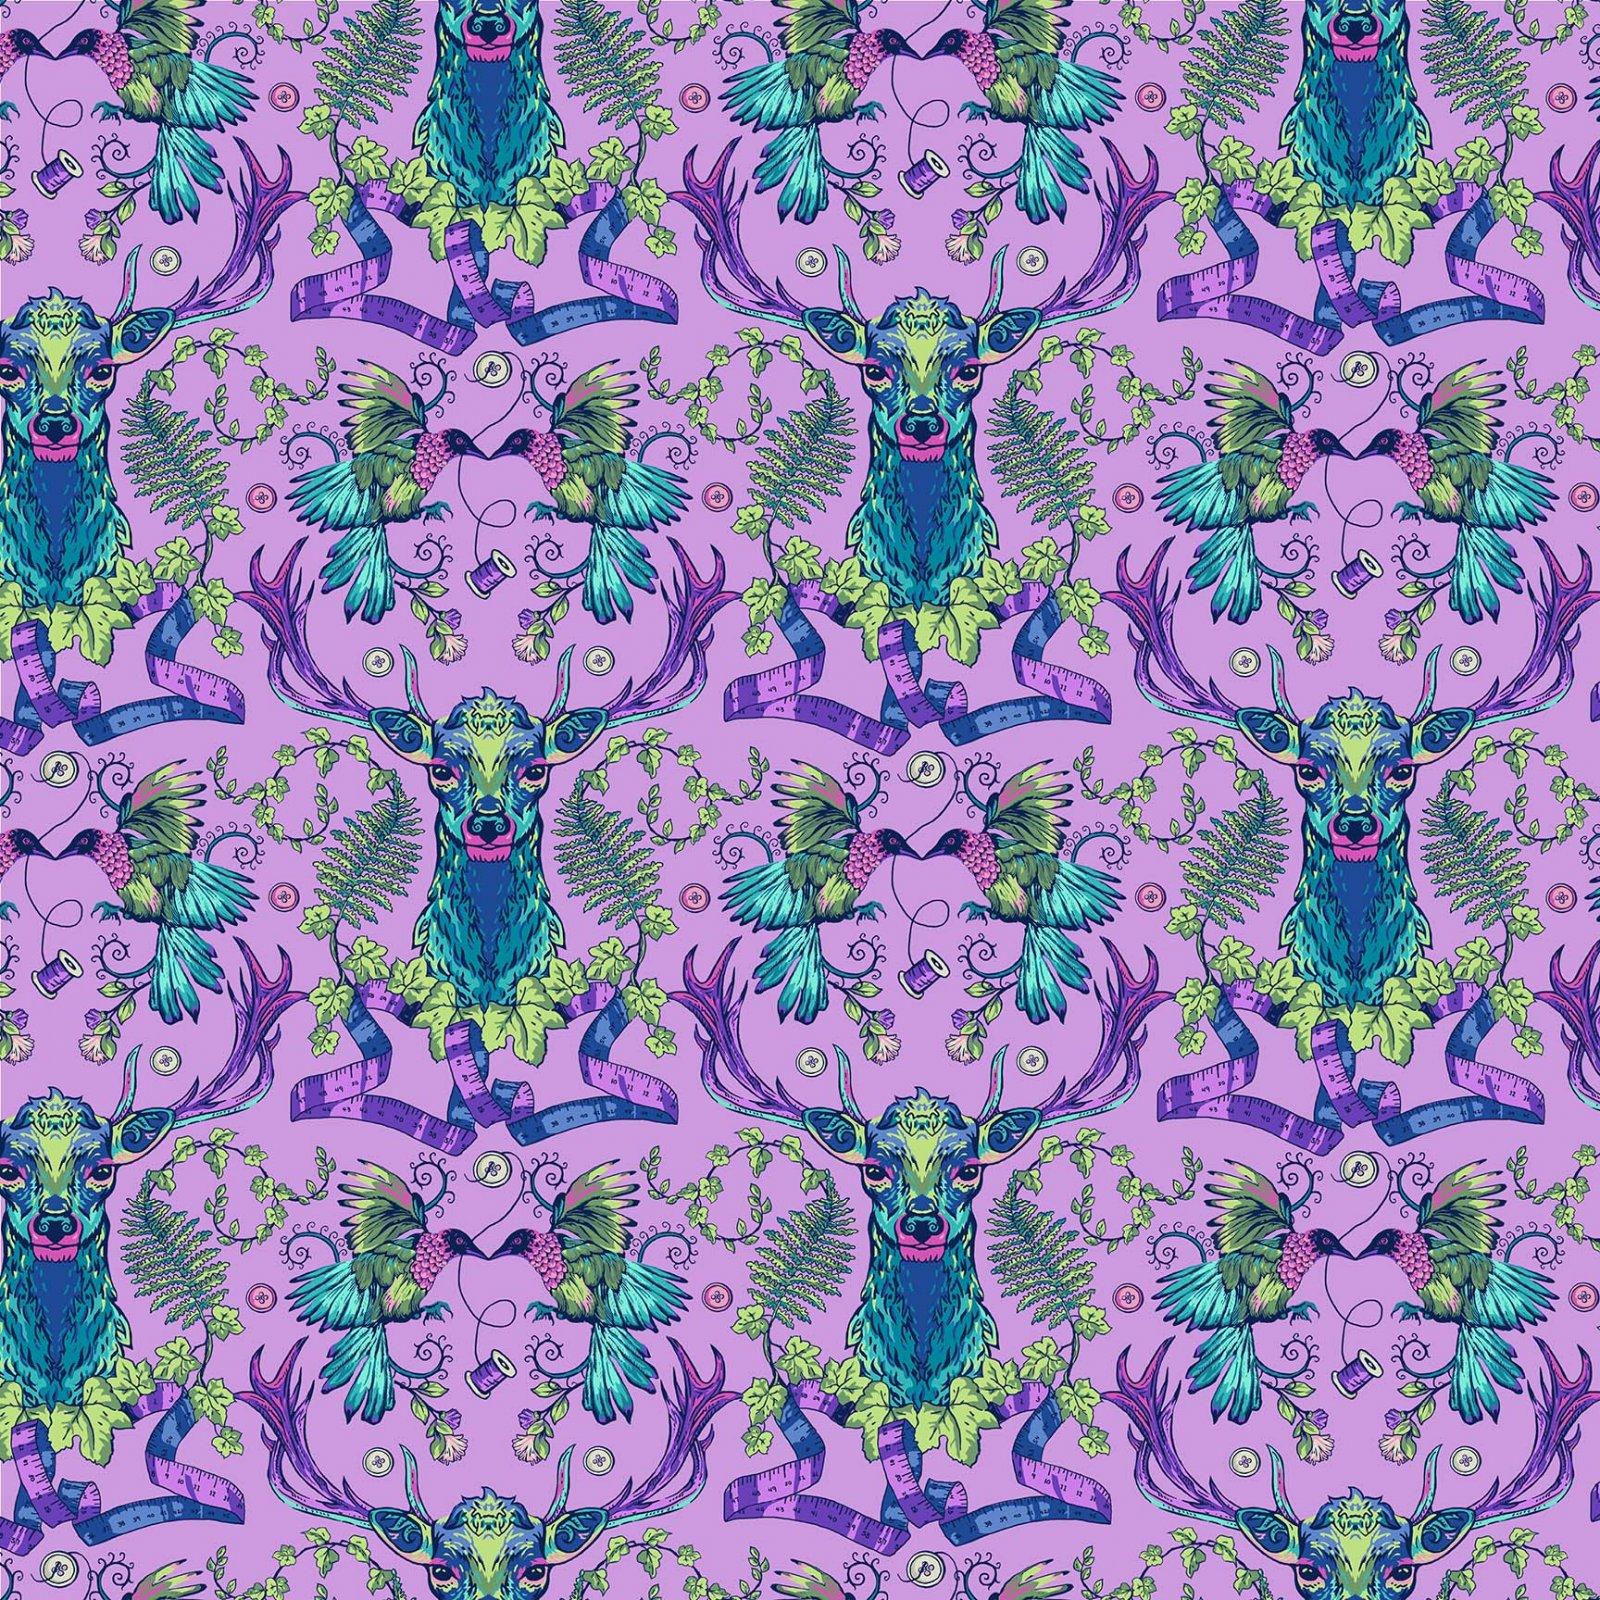 NORTH- Stag and Thistle Light Purple Deer Ridge